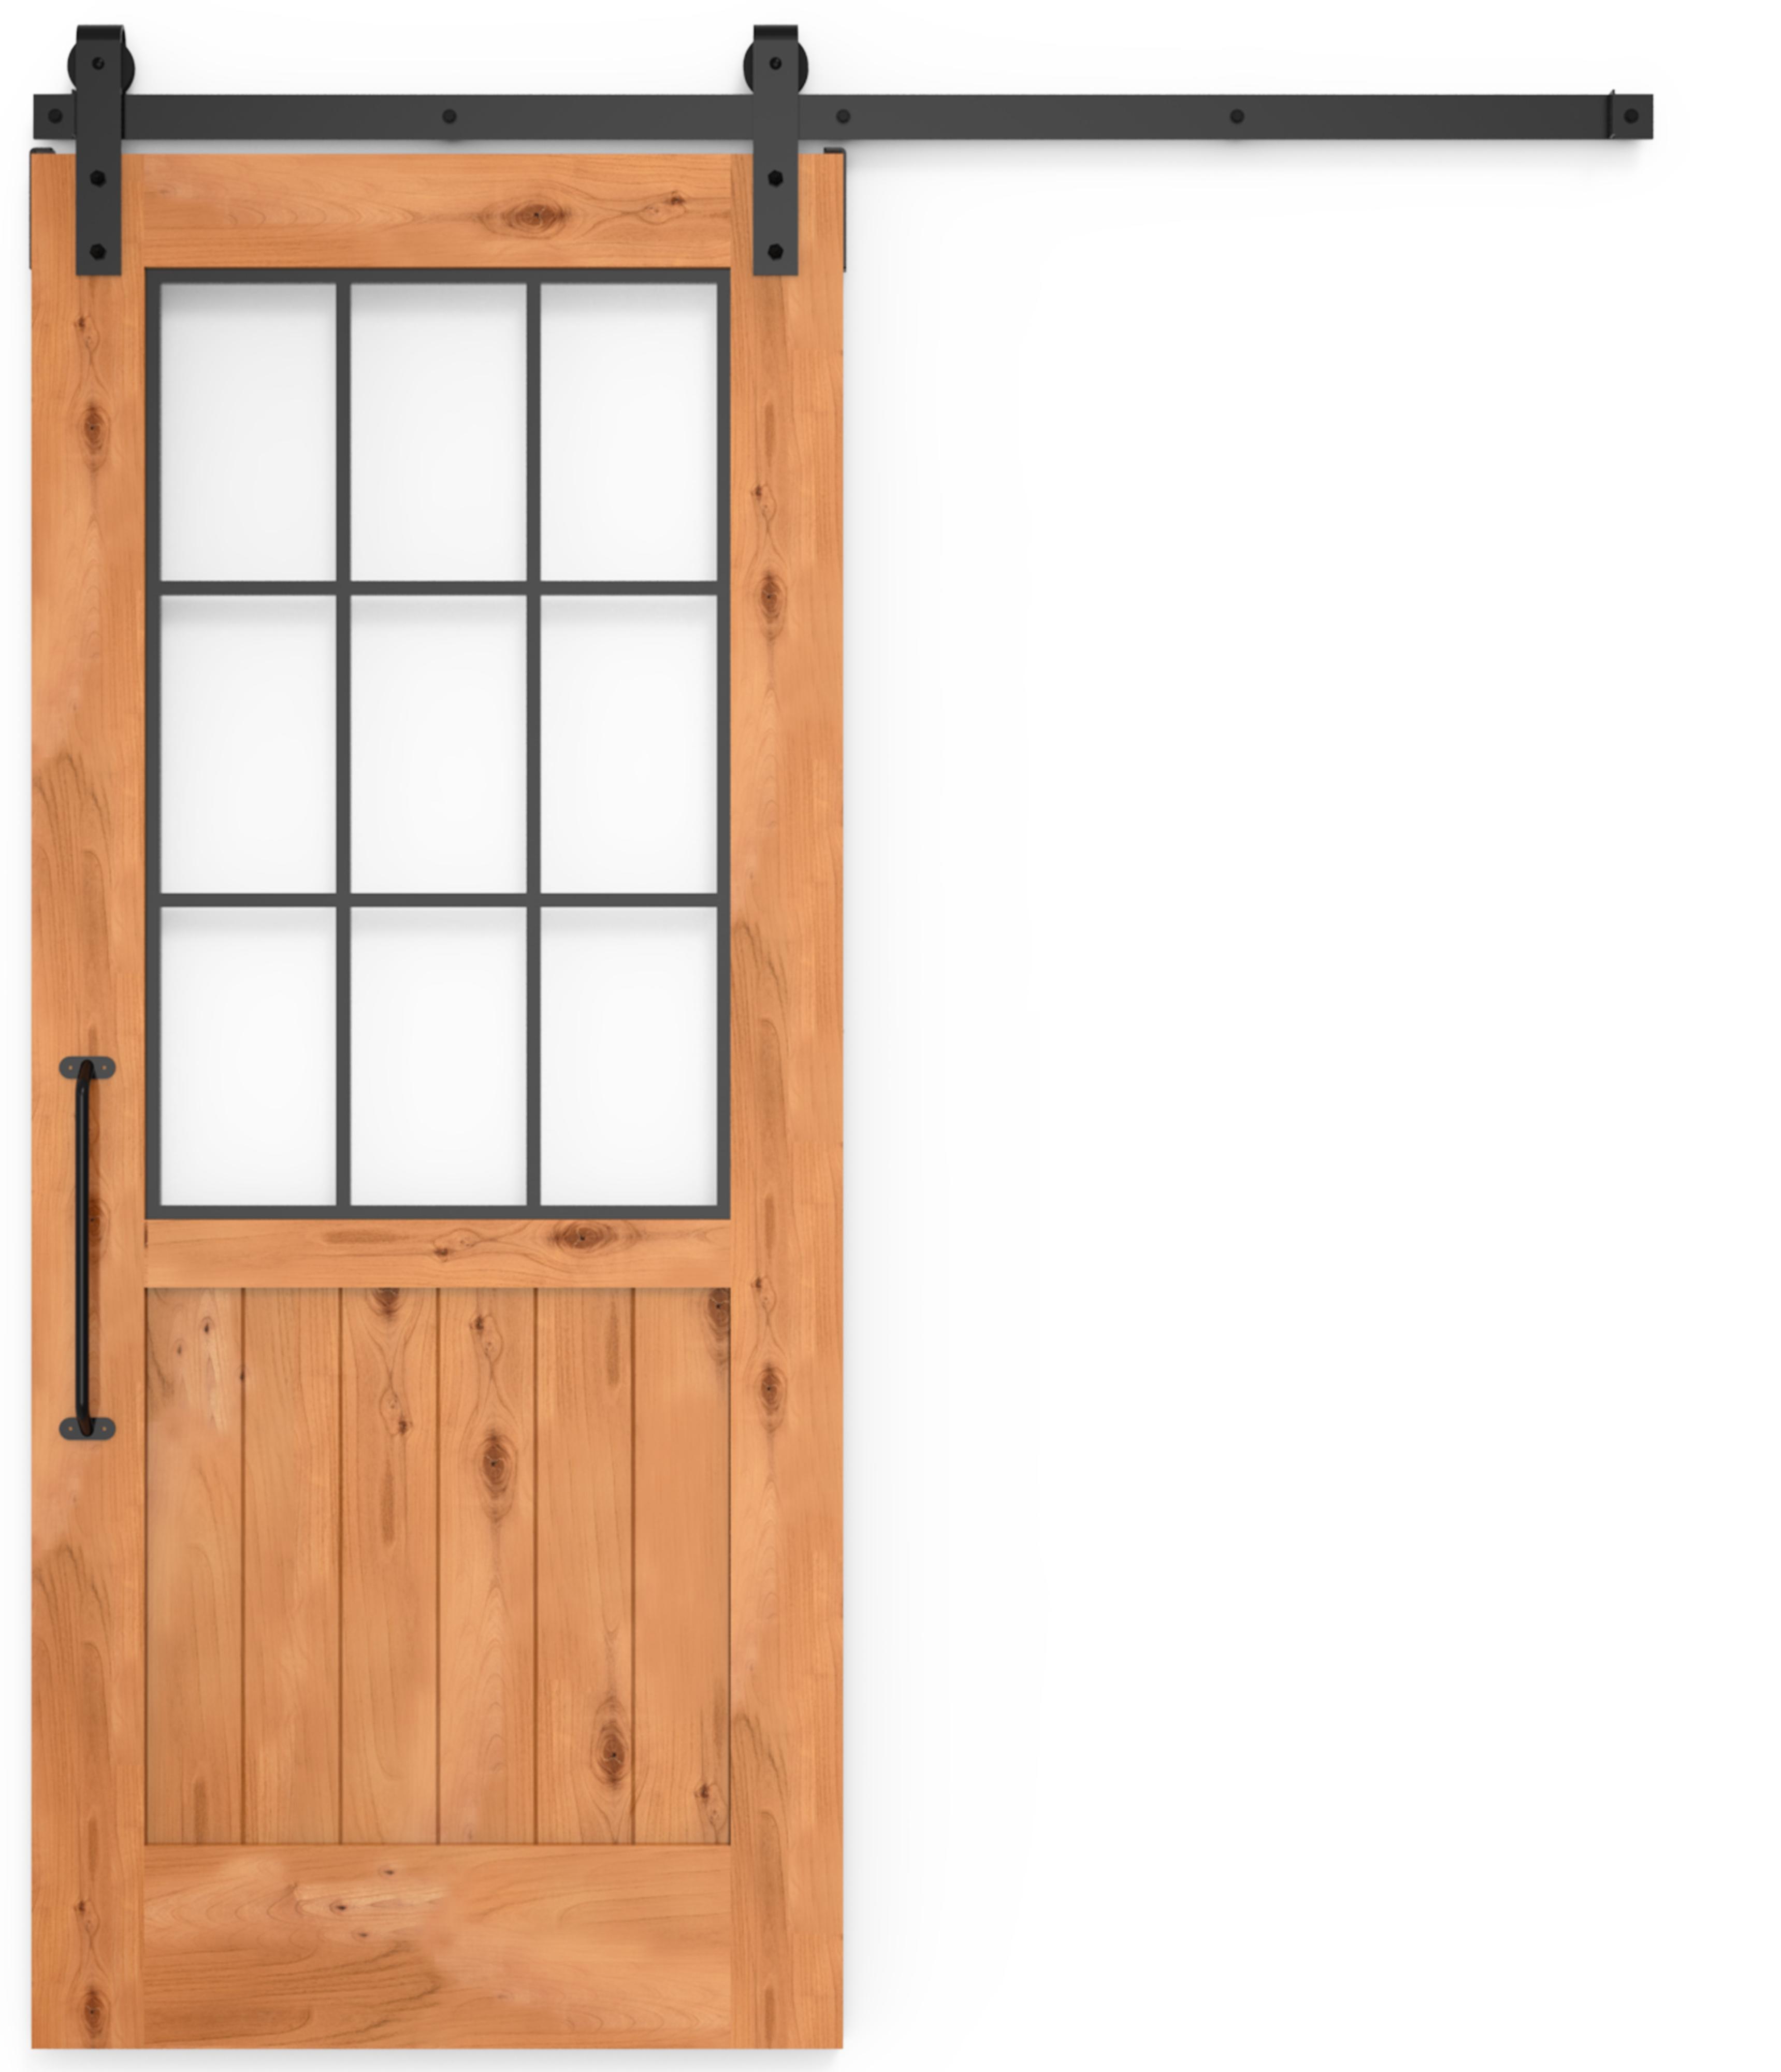 Farmhouse Sliding Door Wall: Farmhouse French Barn Door Half Glass